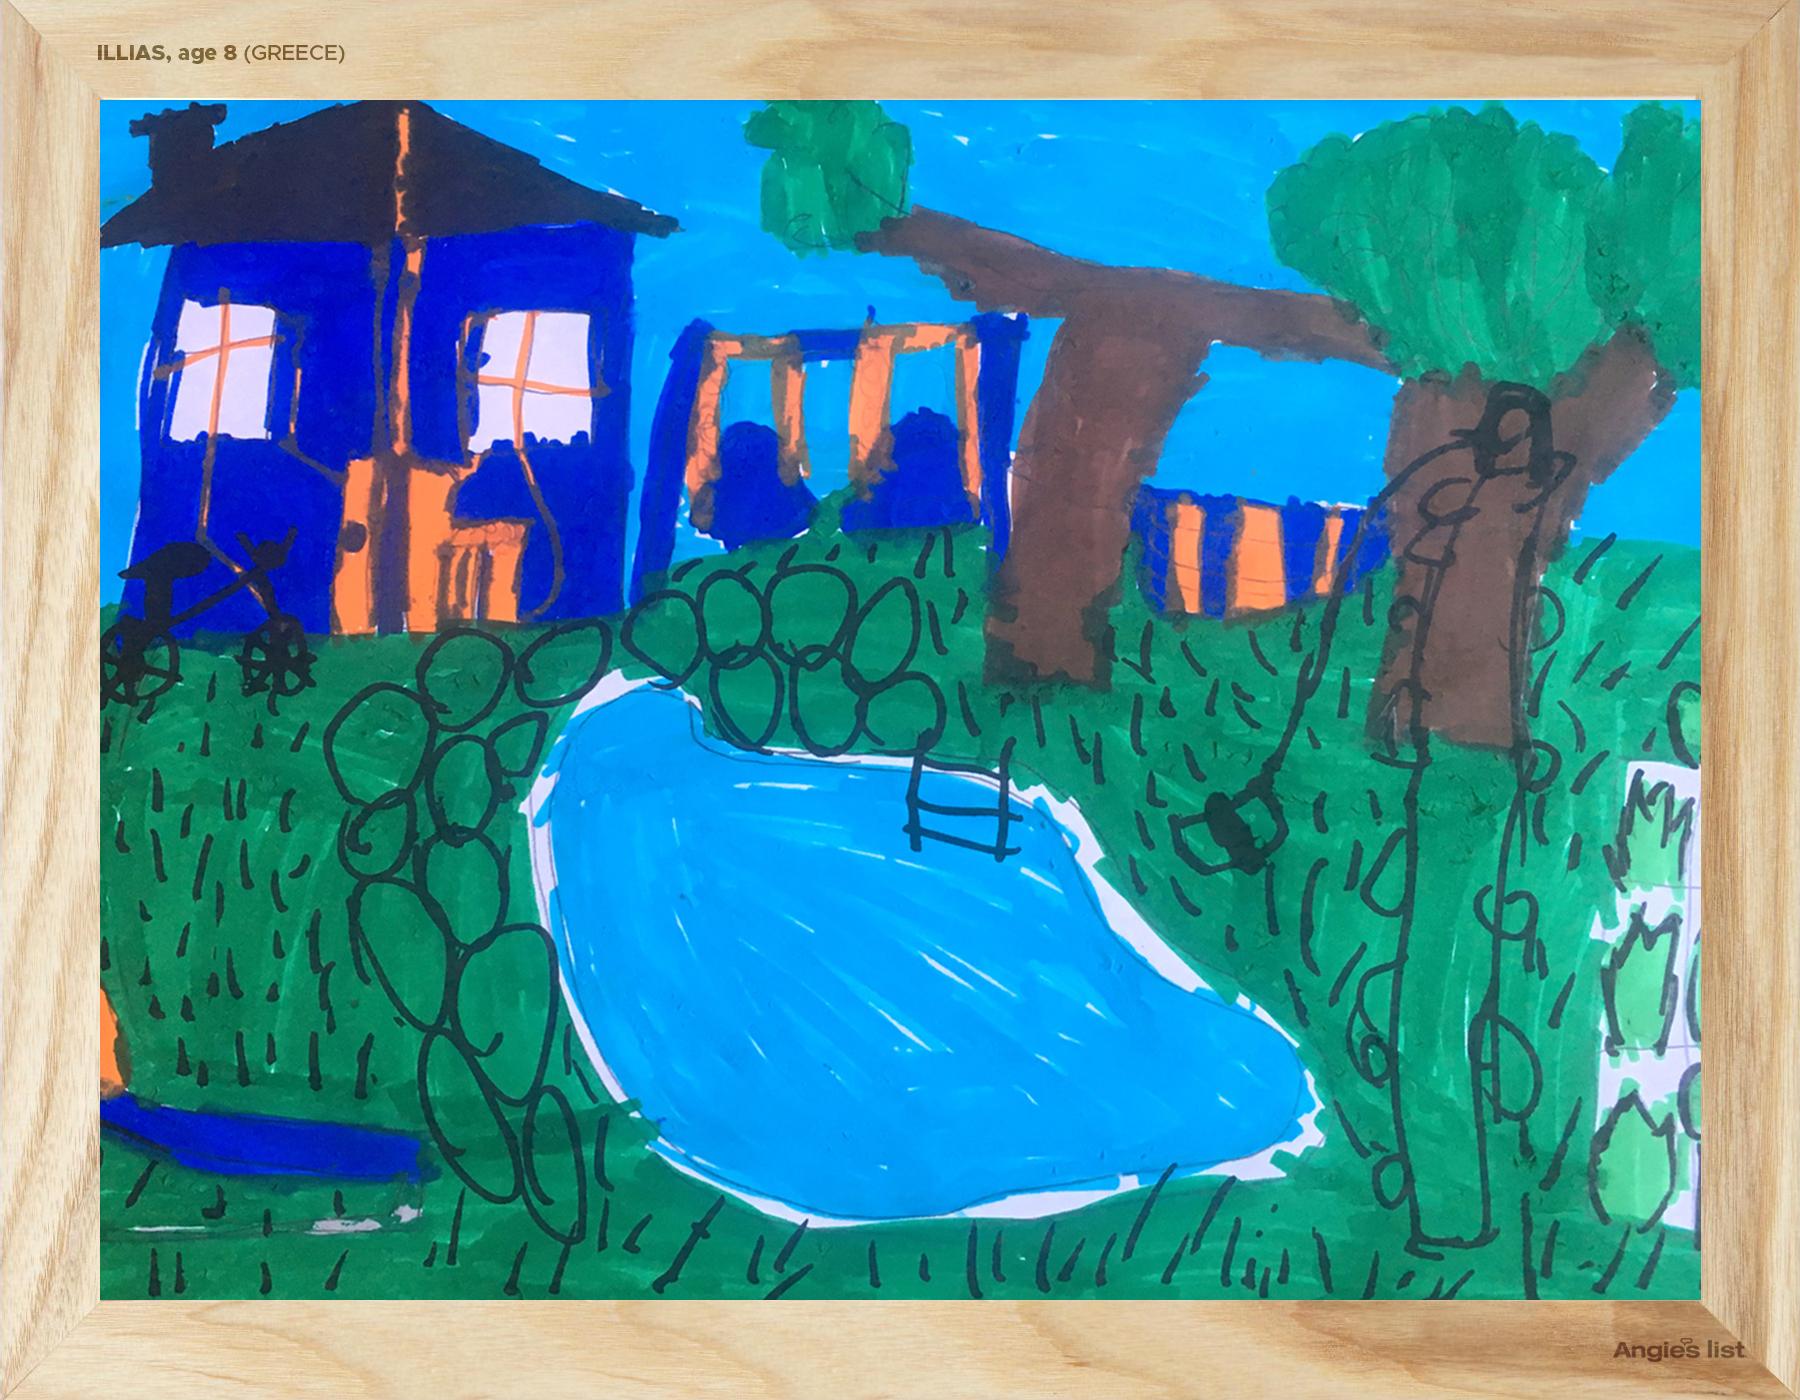 Illias' Dream Backyard